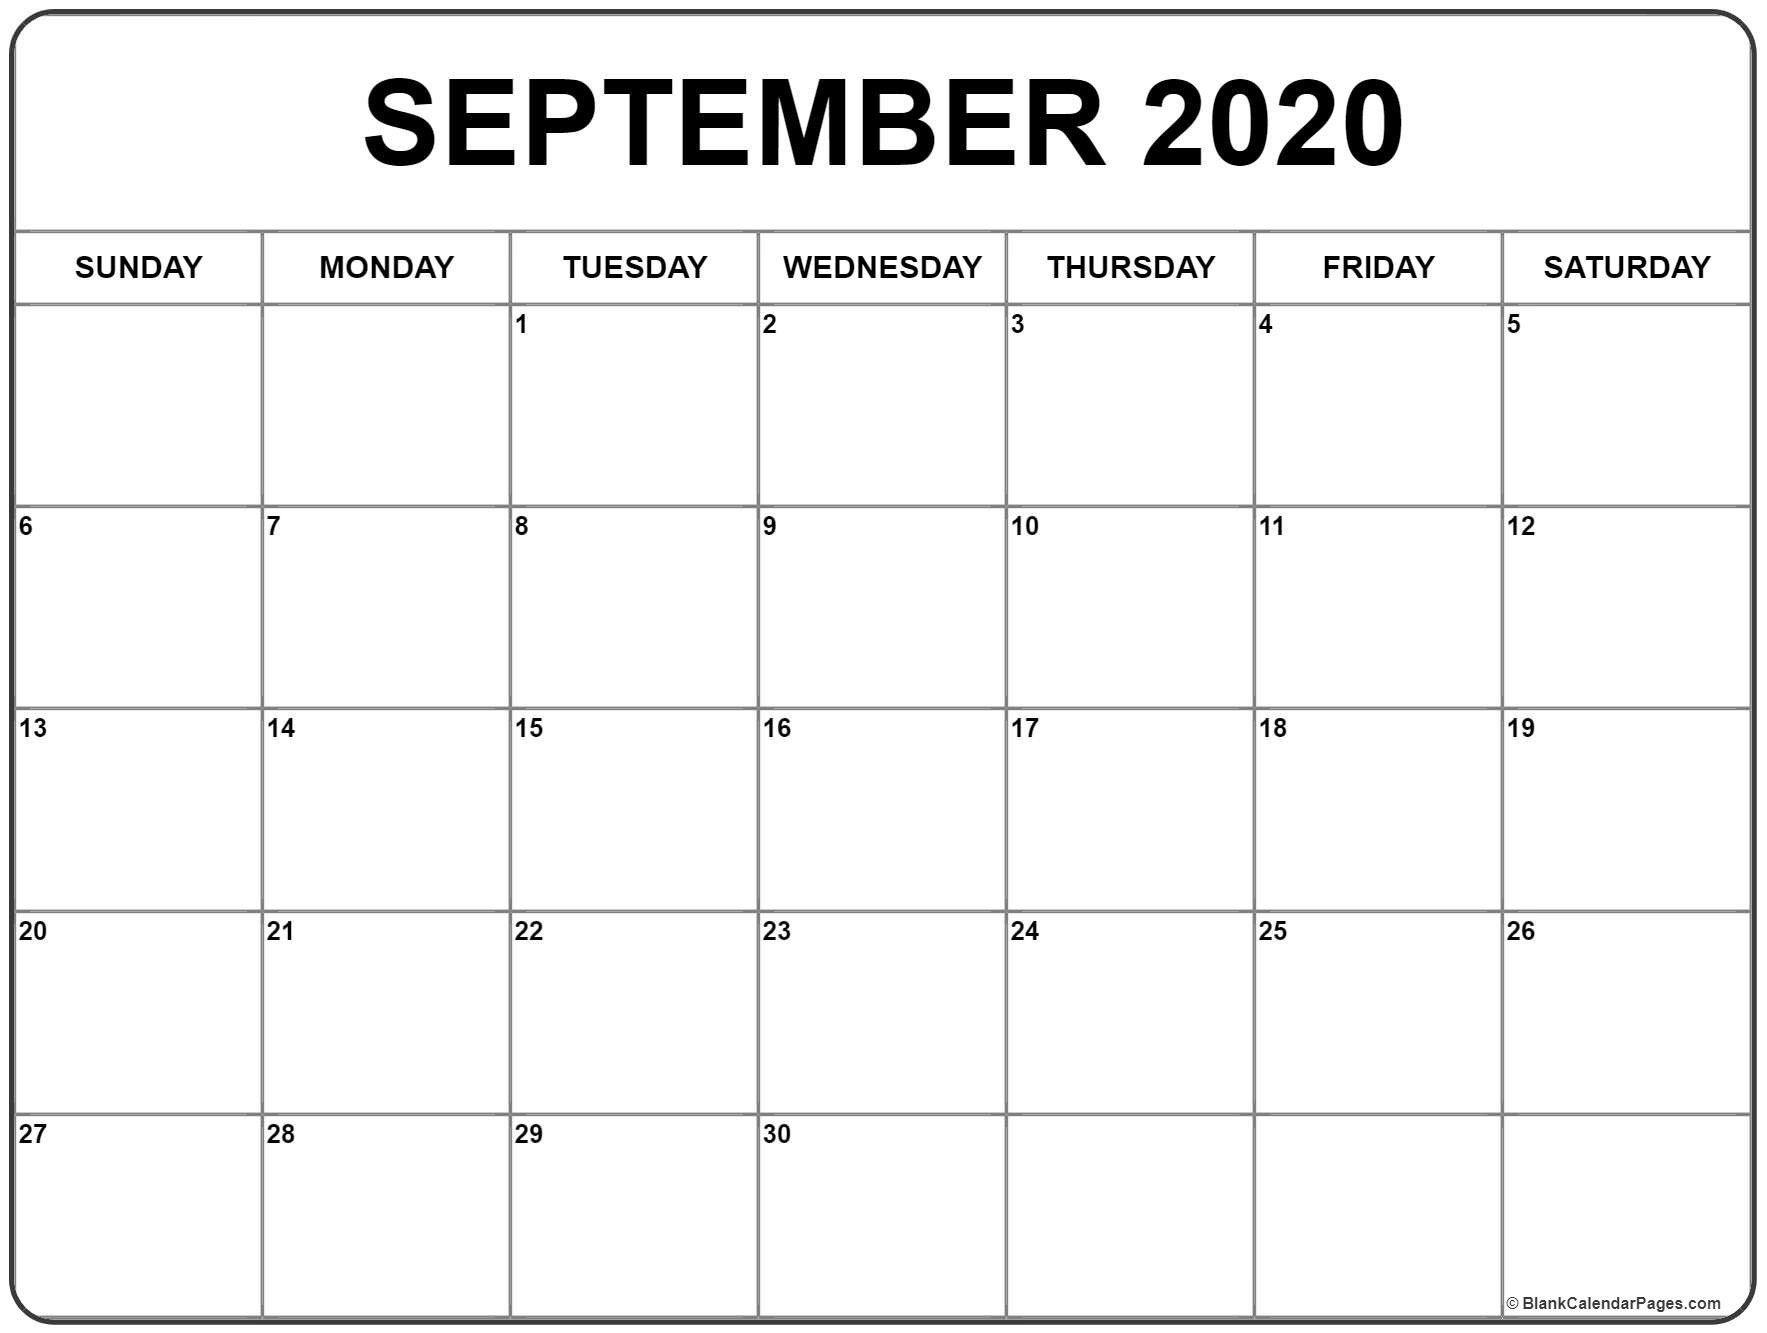 September 2020 Calendar 51 Calendar Templates Of 2020-2020 Jewish Holidays Printable Calendar